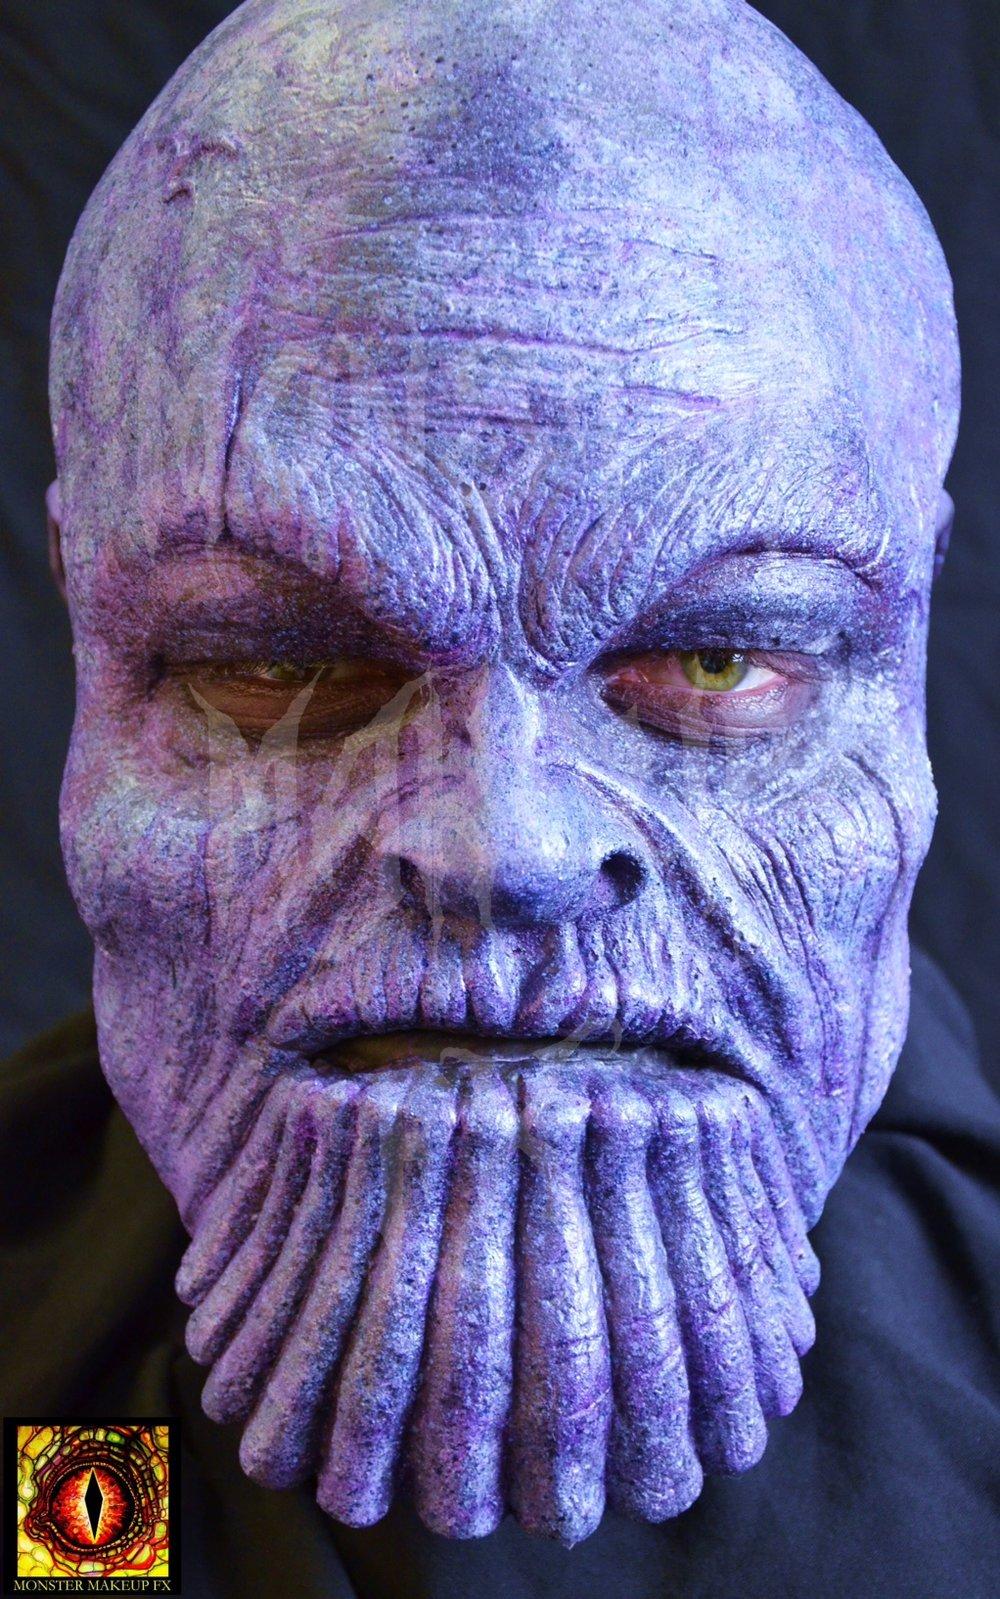 Thanos Head On Watermarked.jpg